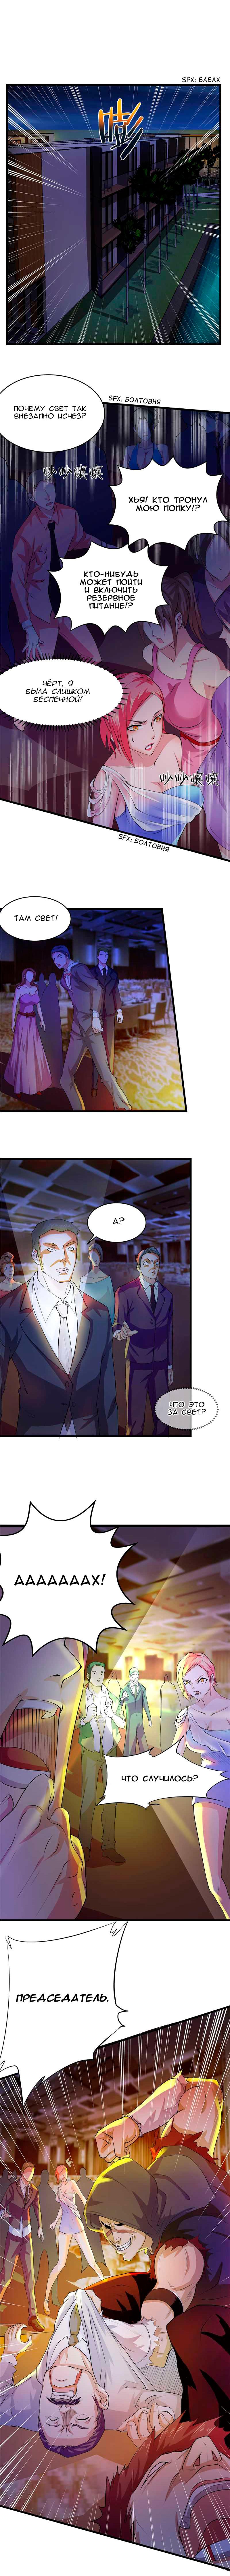 Манга Первоклассный мастер / First Rate Master  - Том 1 Глава 20 Страница 2